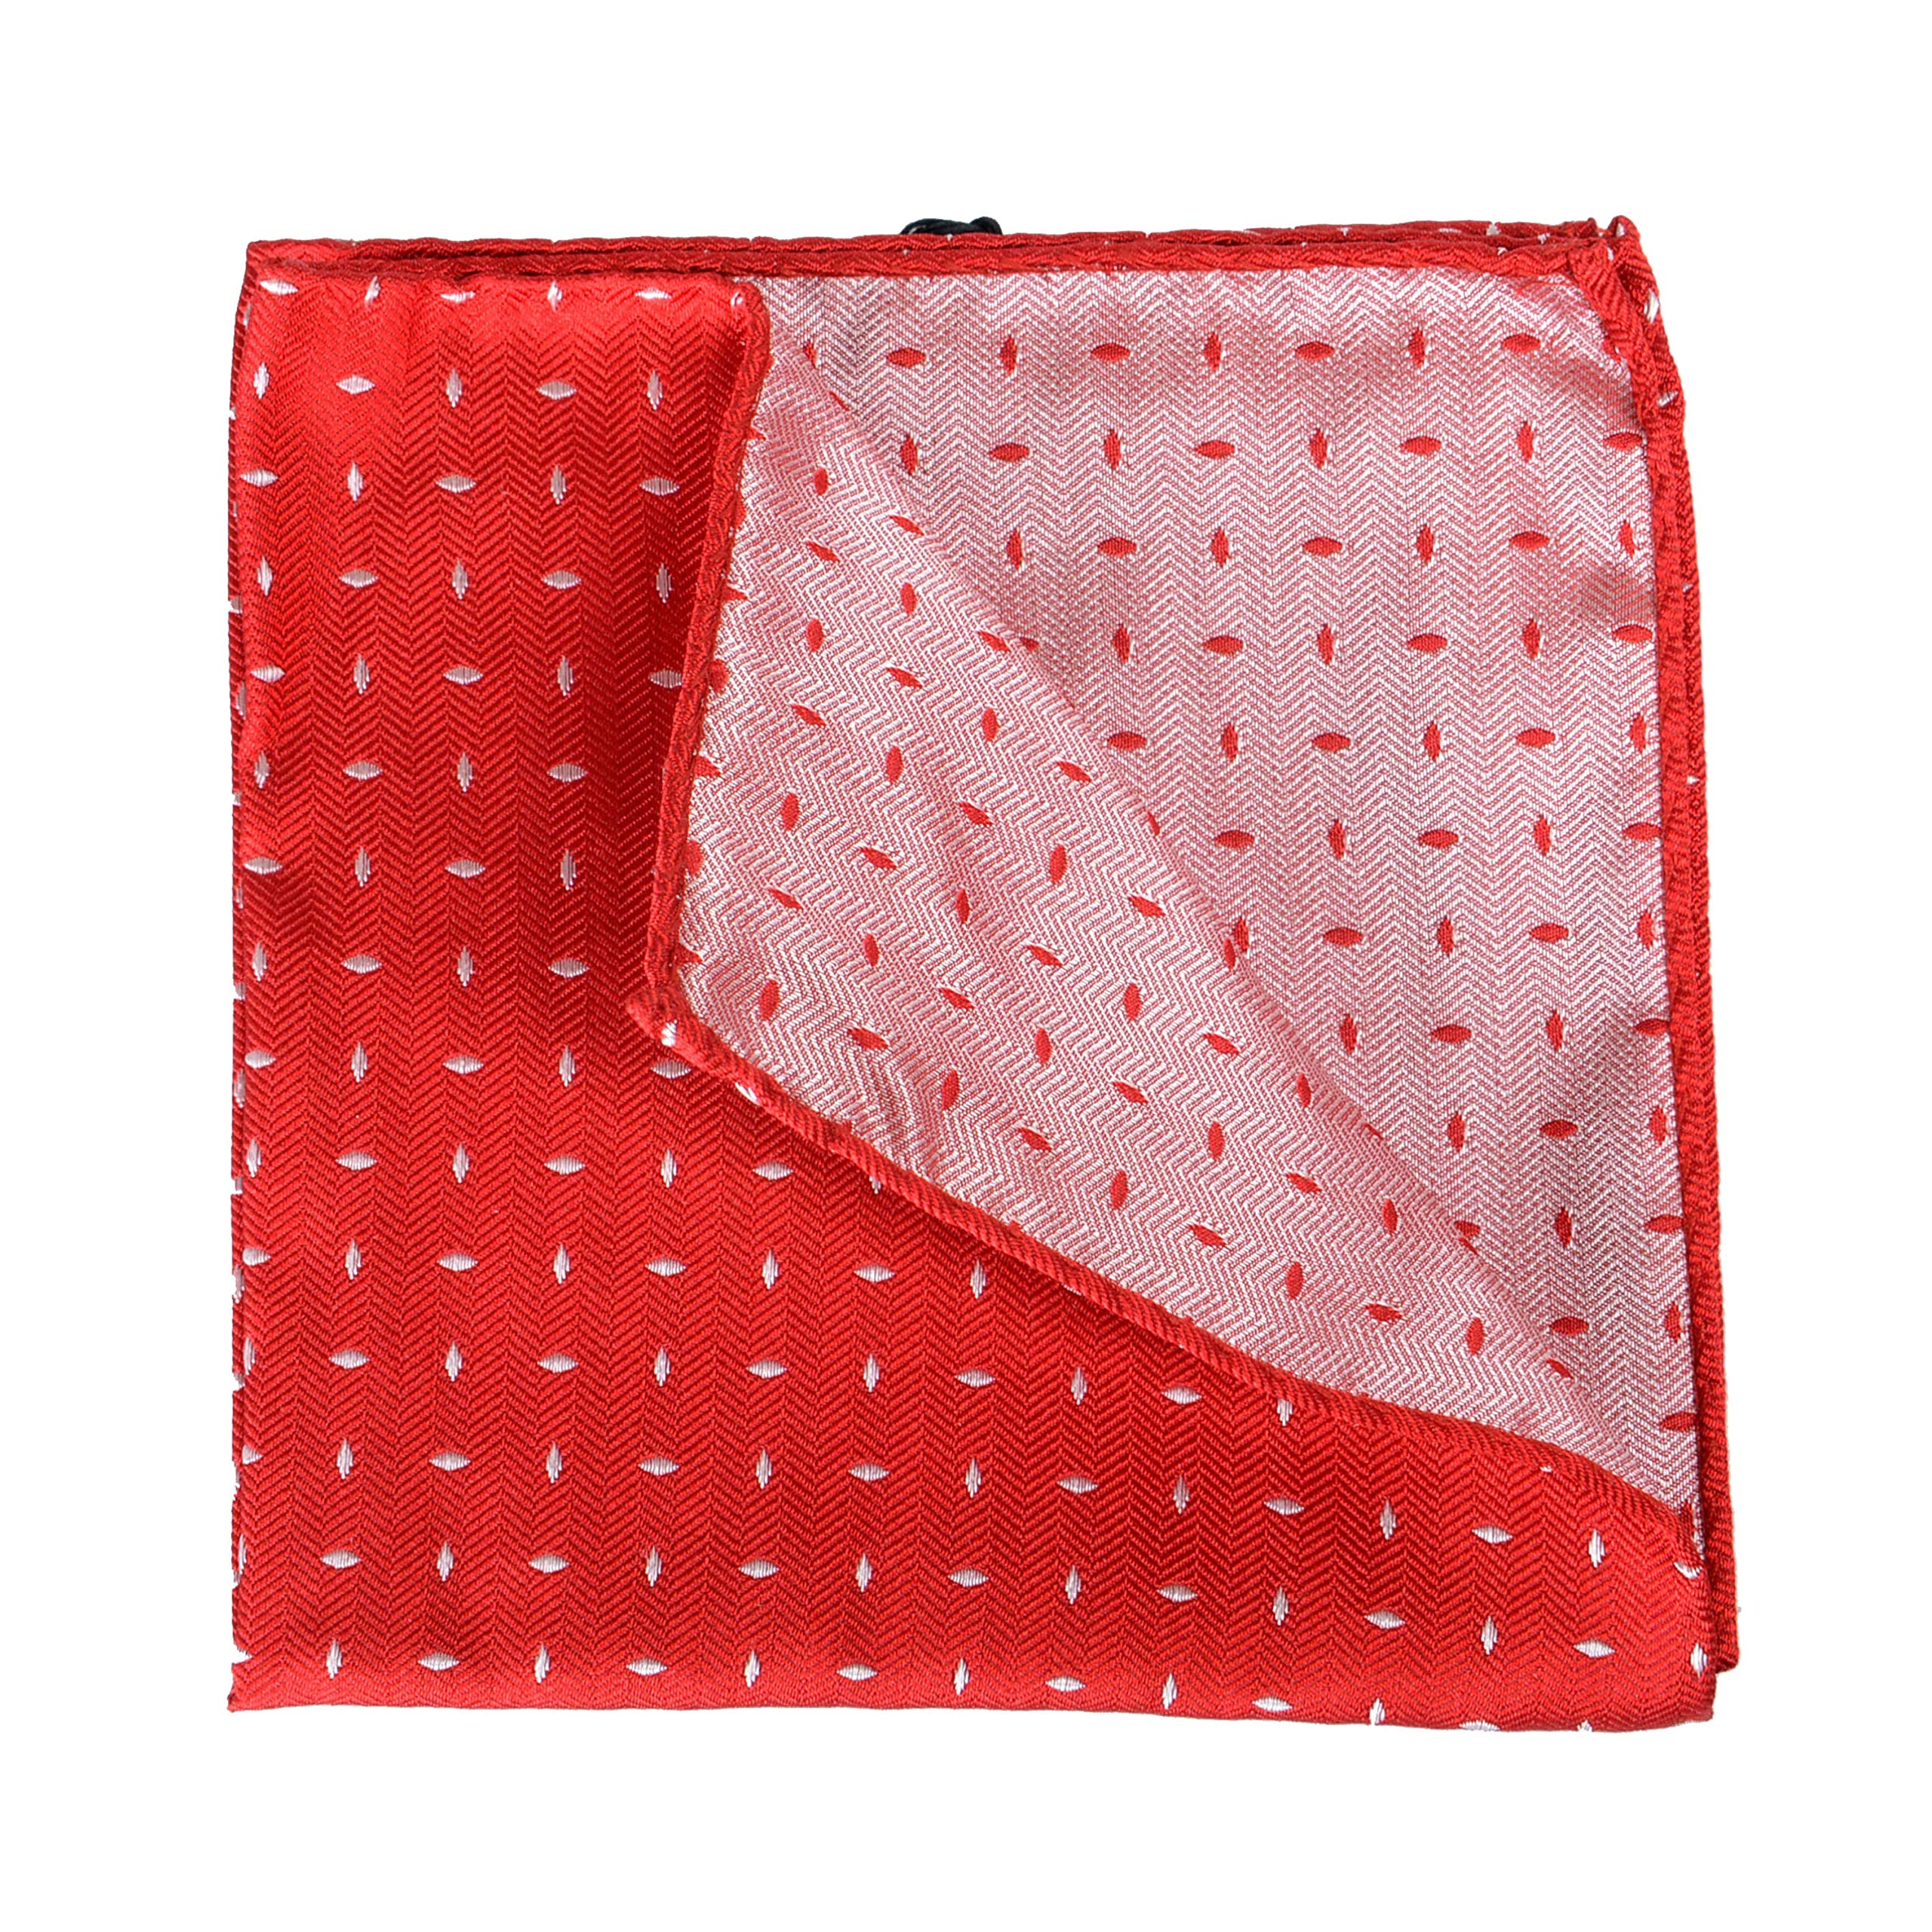 Dsquared2 Men's 100% Silk Red Pocket Square